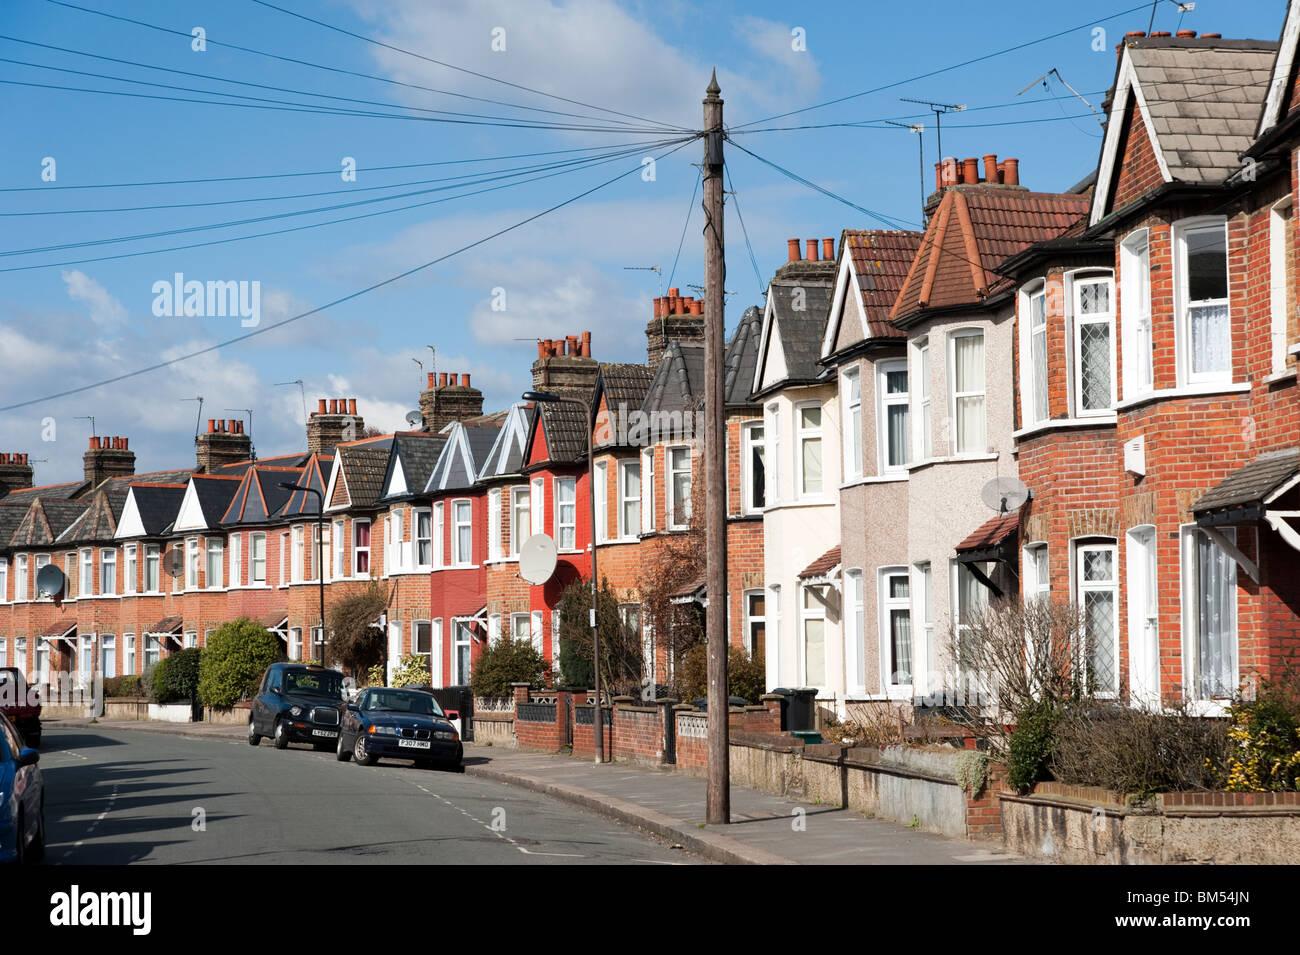 Reihe von Reihenhäusern in Wohn Street, London, England, UK Stockbild